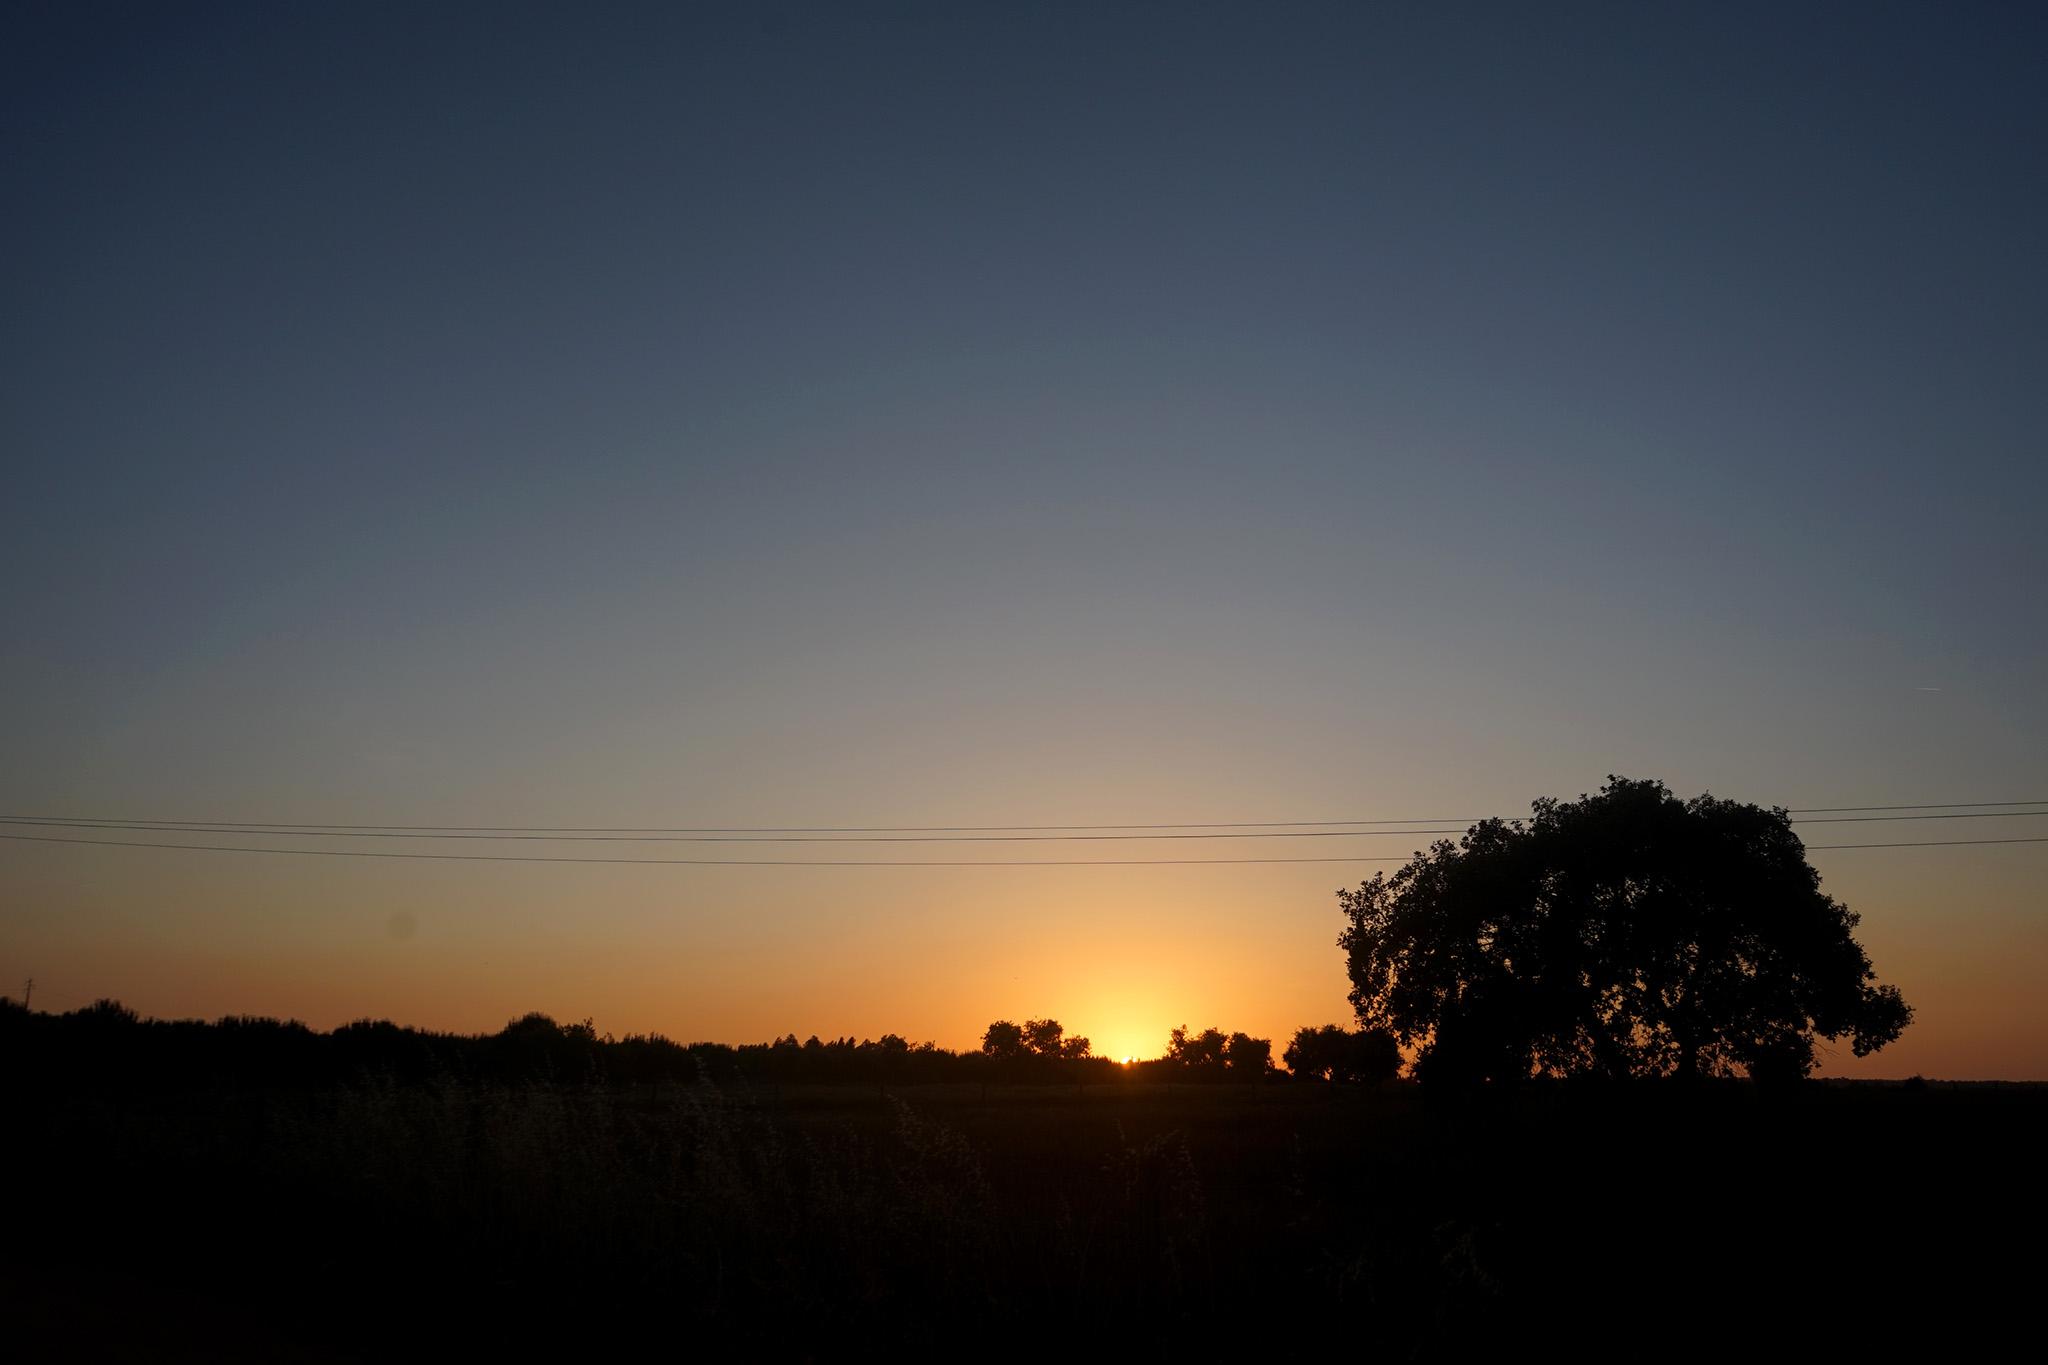 2017-04-Casas-da-Cerca-Portugal - casas-da-cerca-portugal-nectarandpulse-sunset-78.jpg